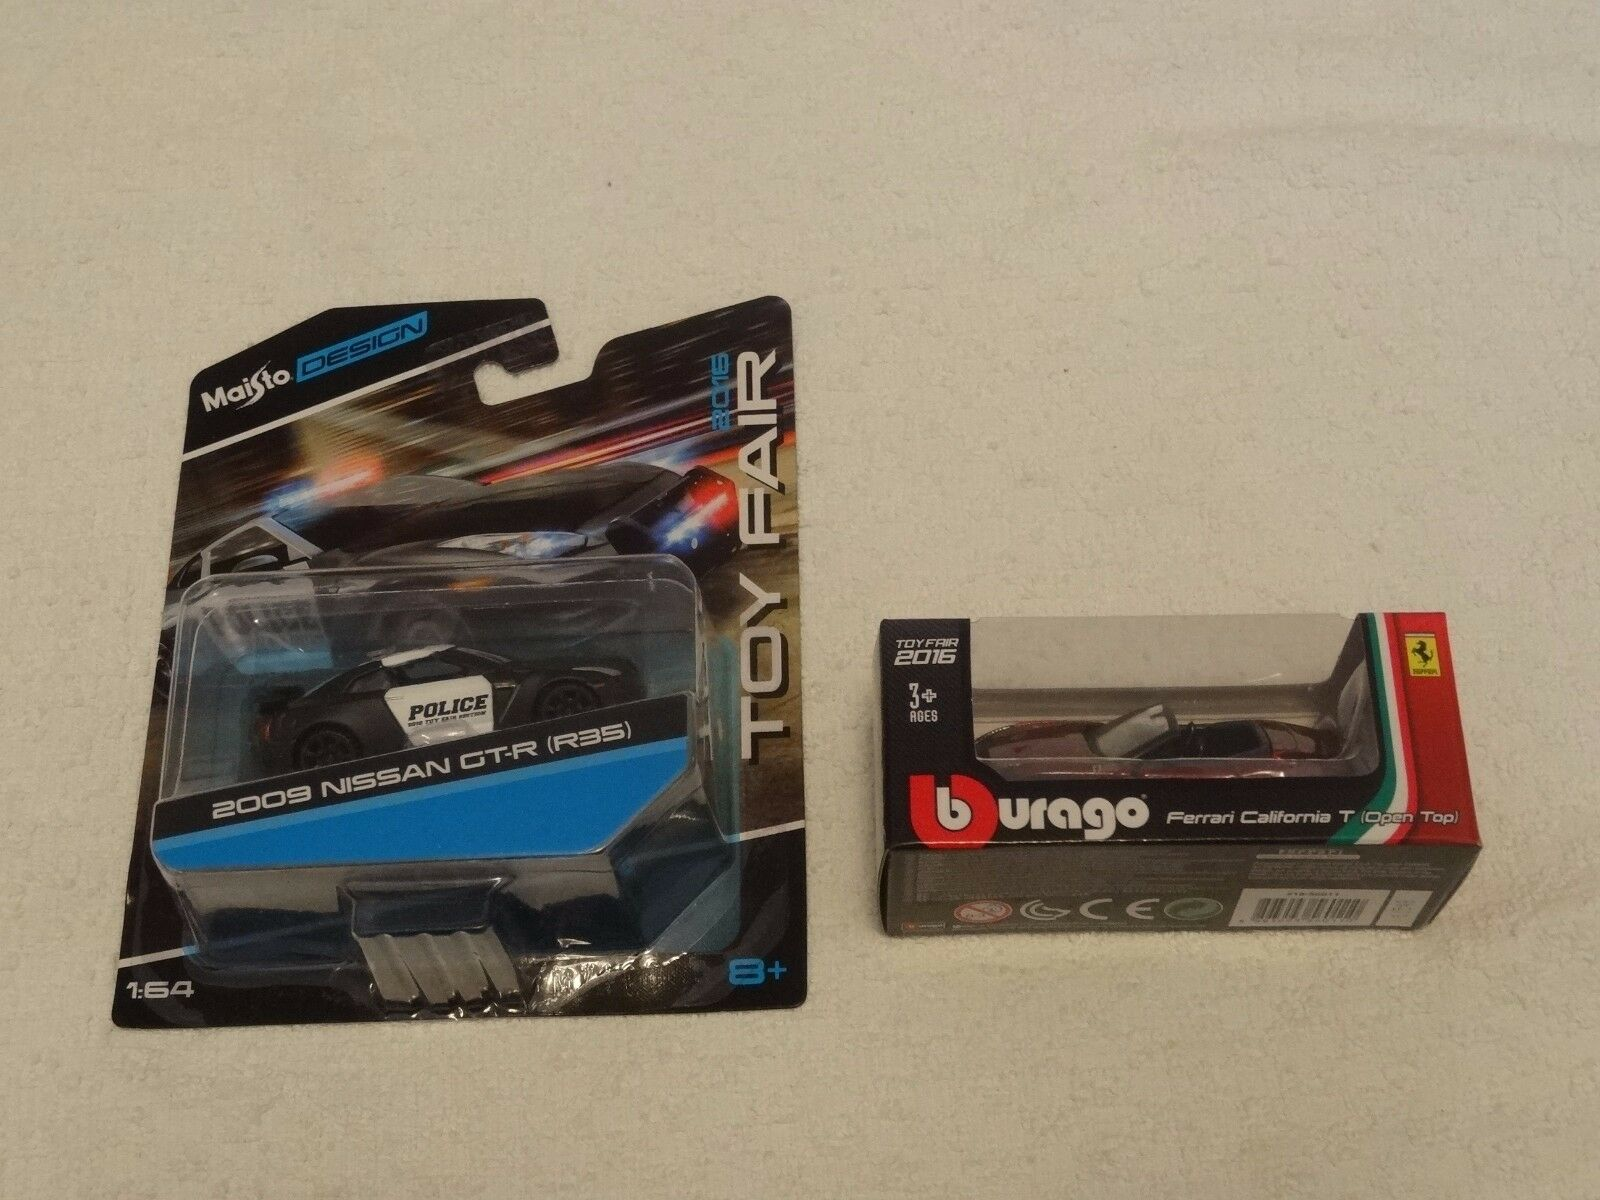 Toy Fair 2016 Maisto 2009 Nissan GT-R R35 & Burago Ferrari California T Open Top